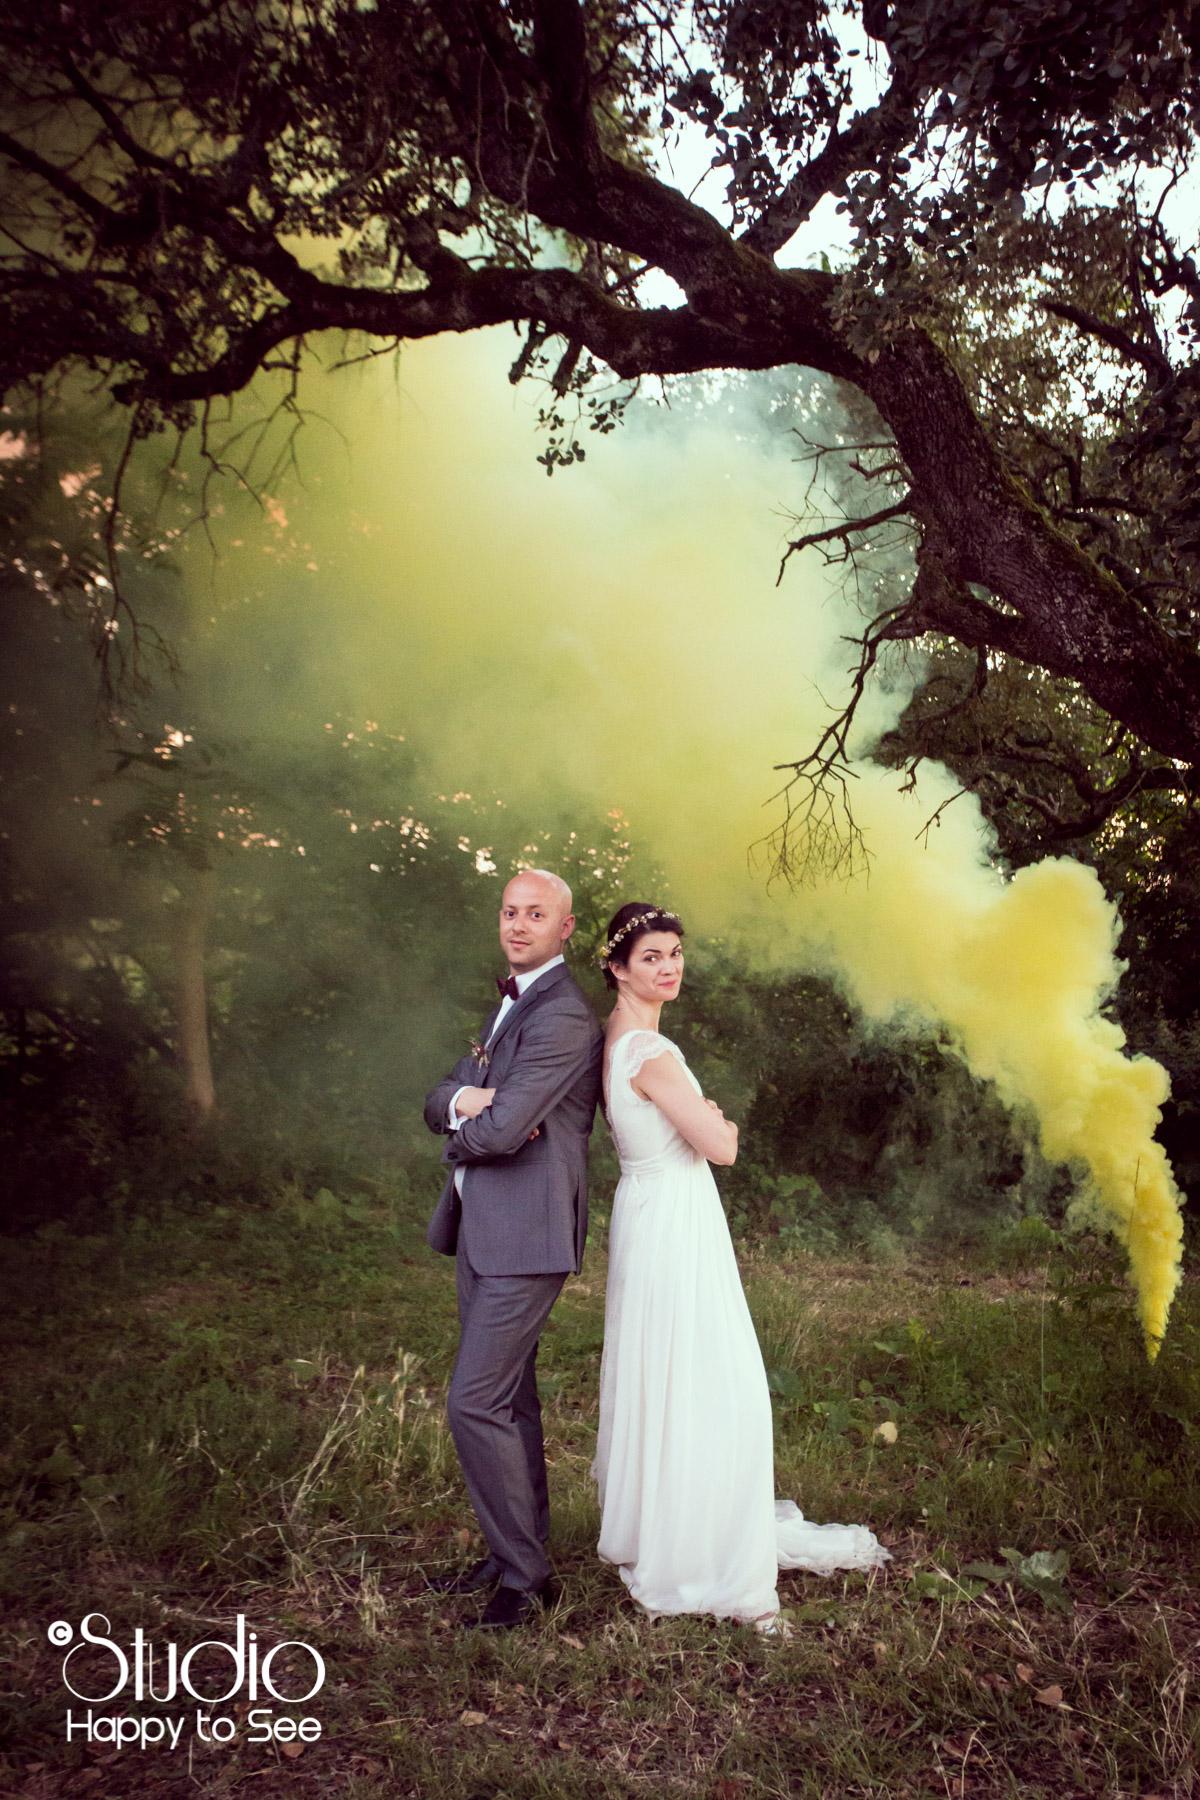 Mariage funky fumigenes